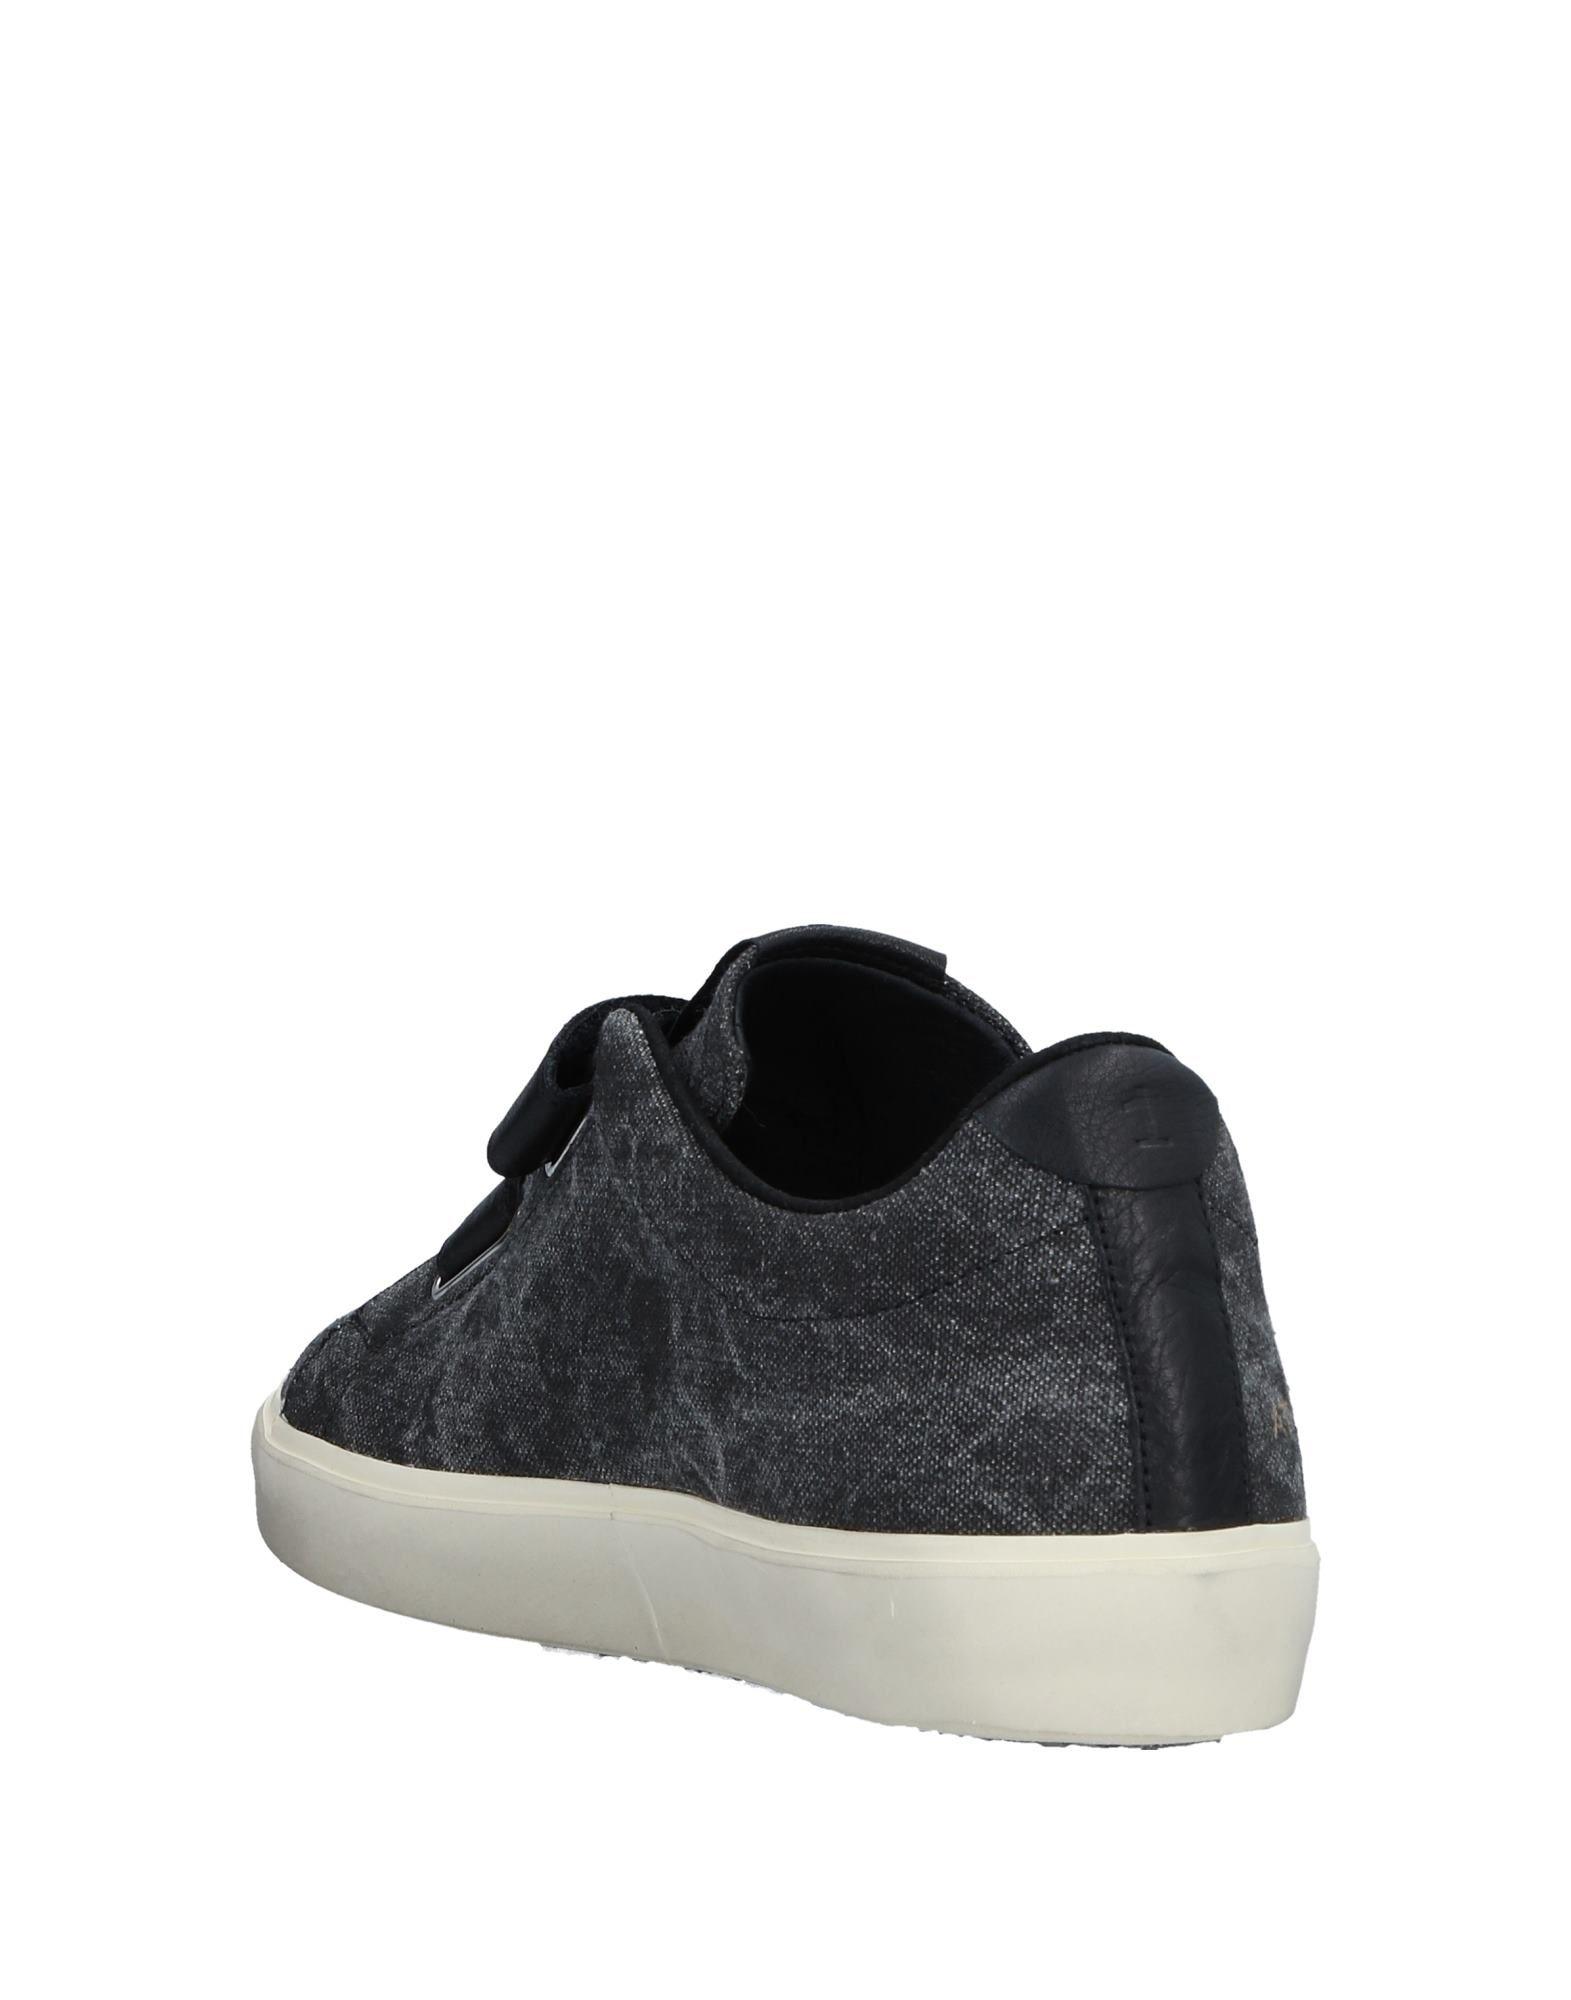 Crown Leather Crown  Sneakers Damen  11543627JM 7a7ef1